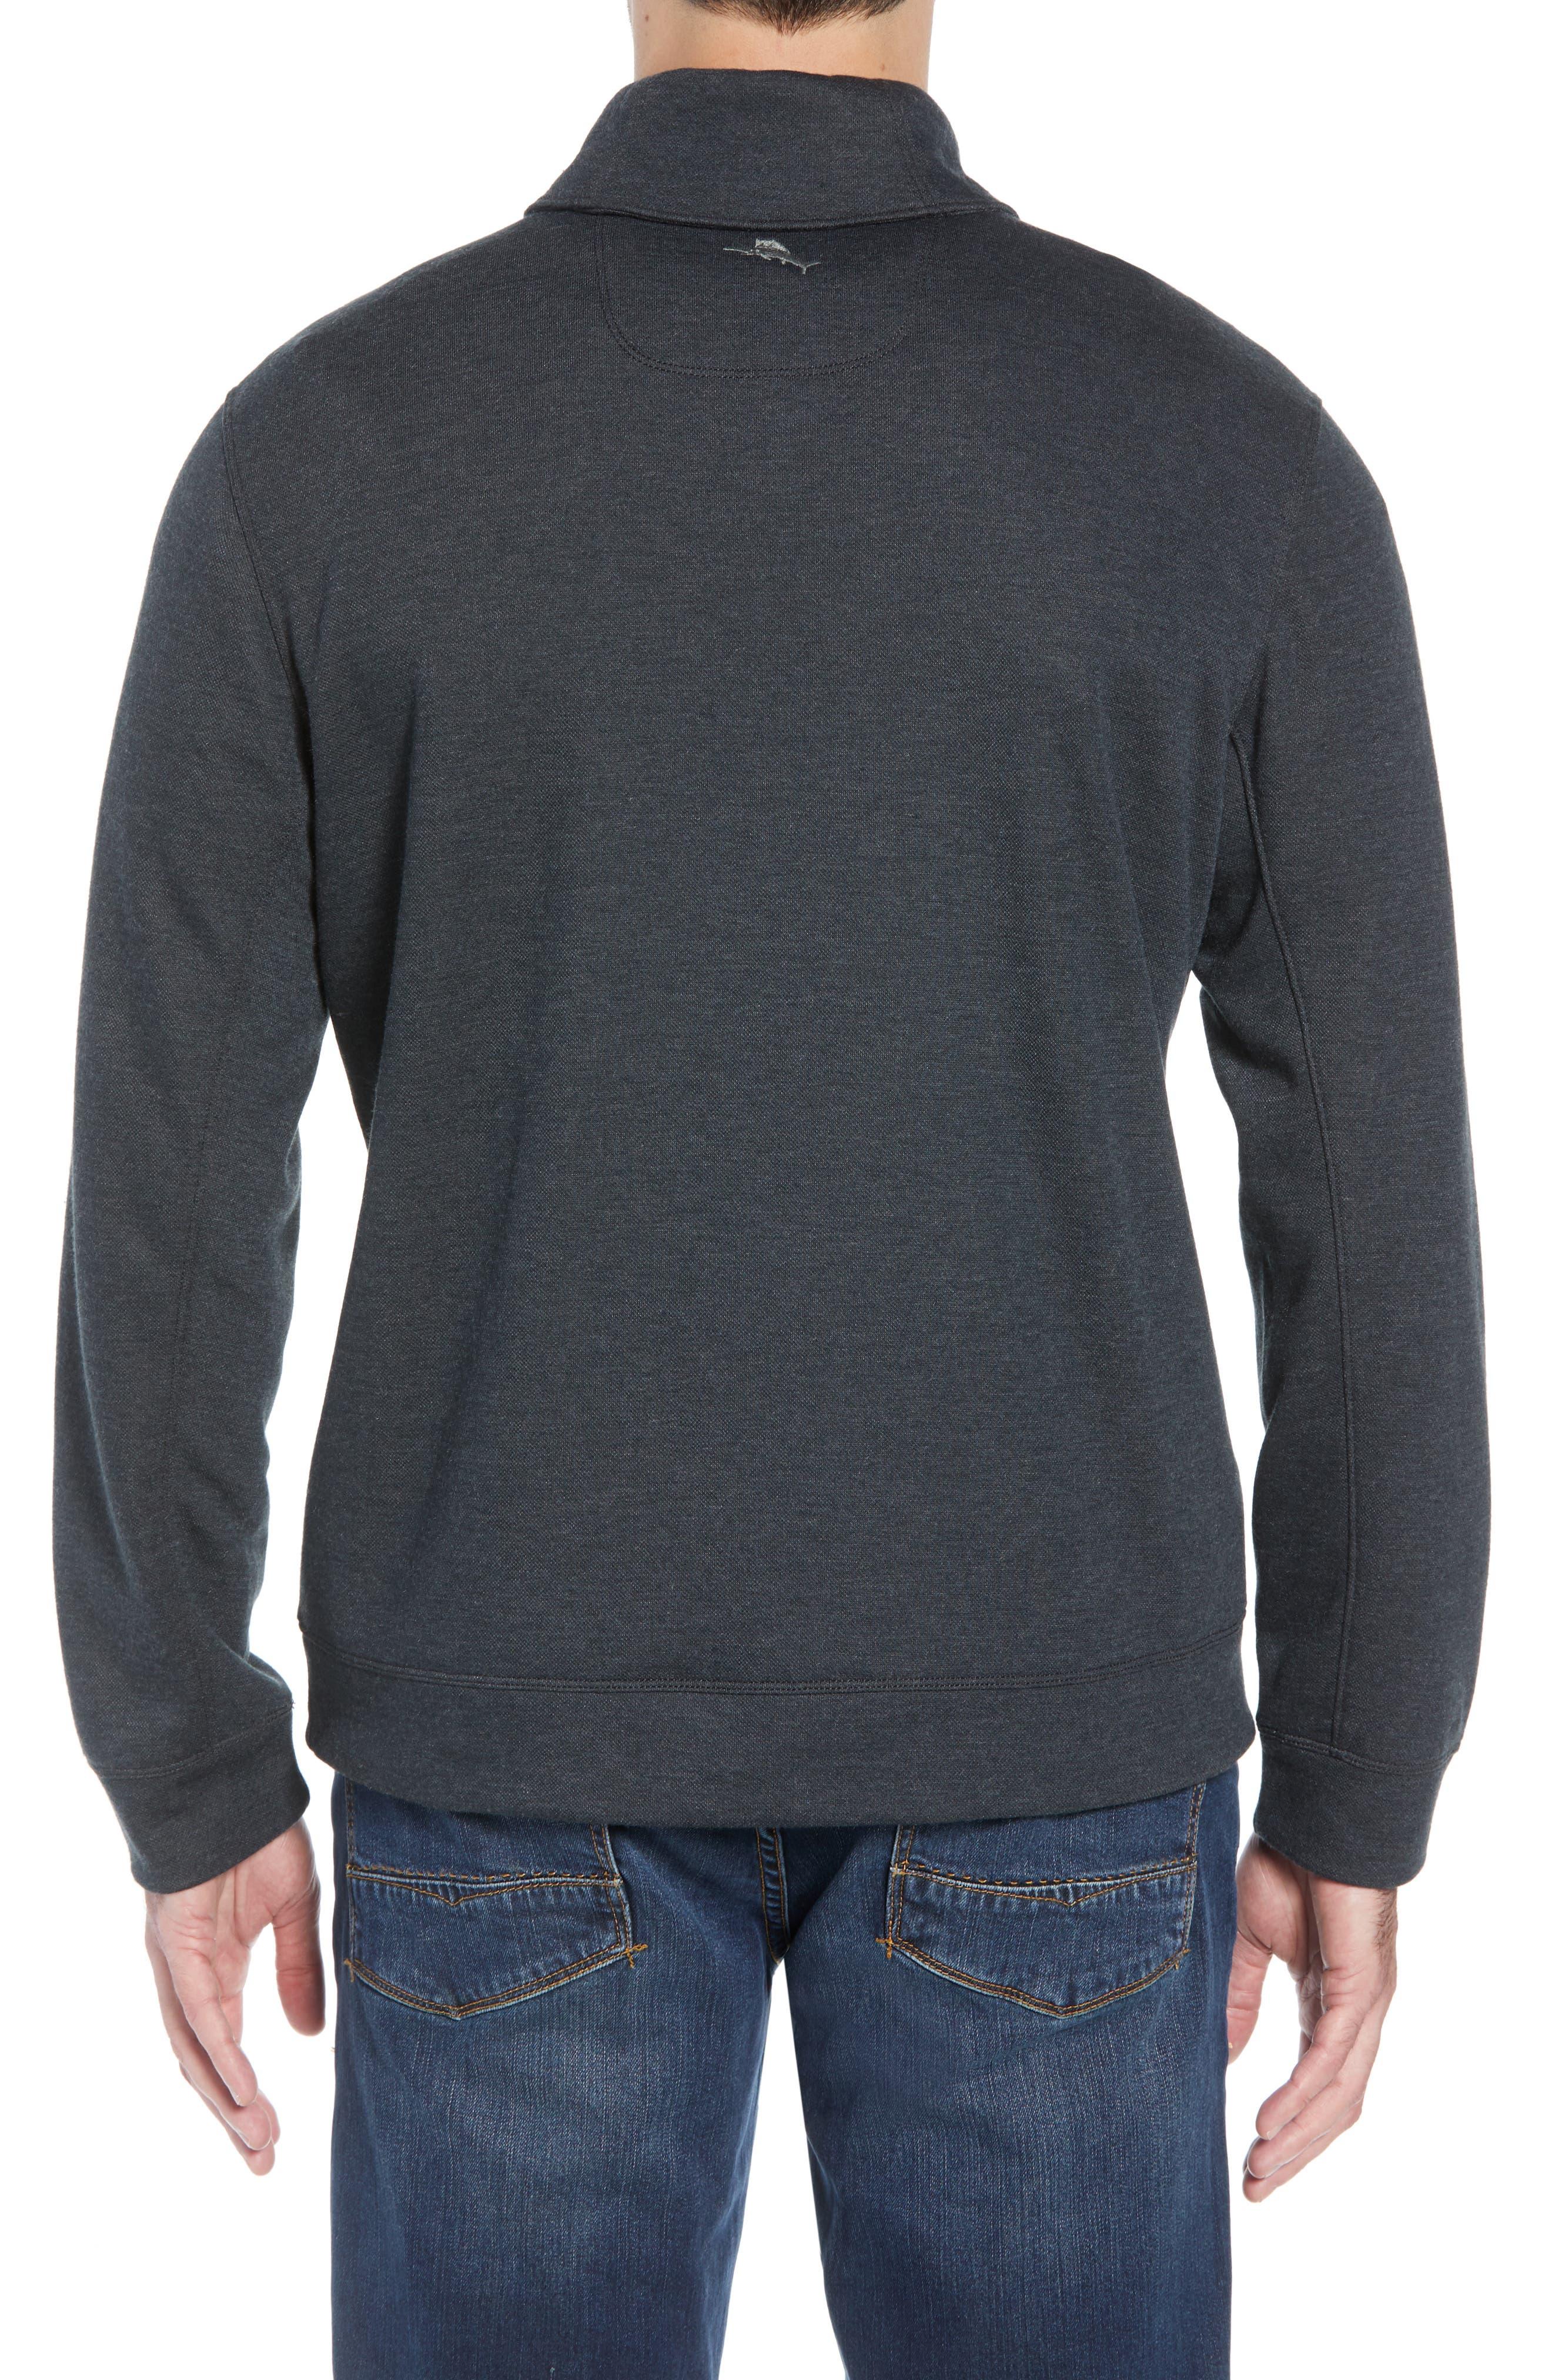 Sandbar Shawl Collar Regular Fit Pullover,                             Alternate thumbnail 2, color,                             COAL